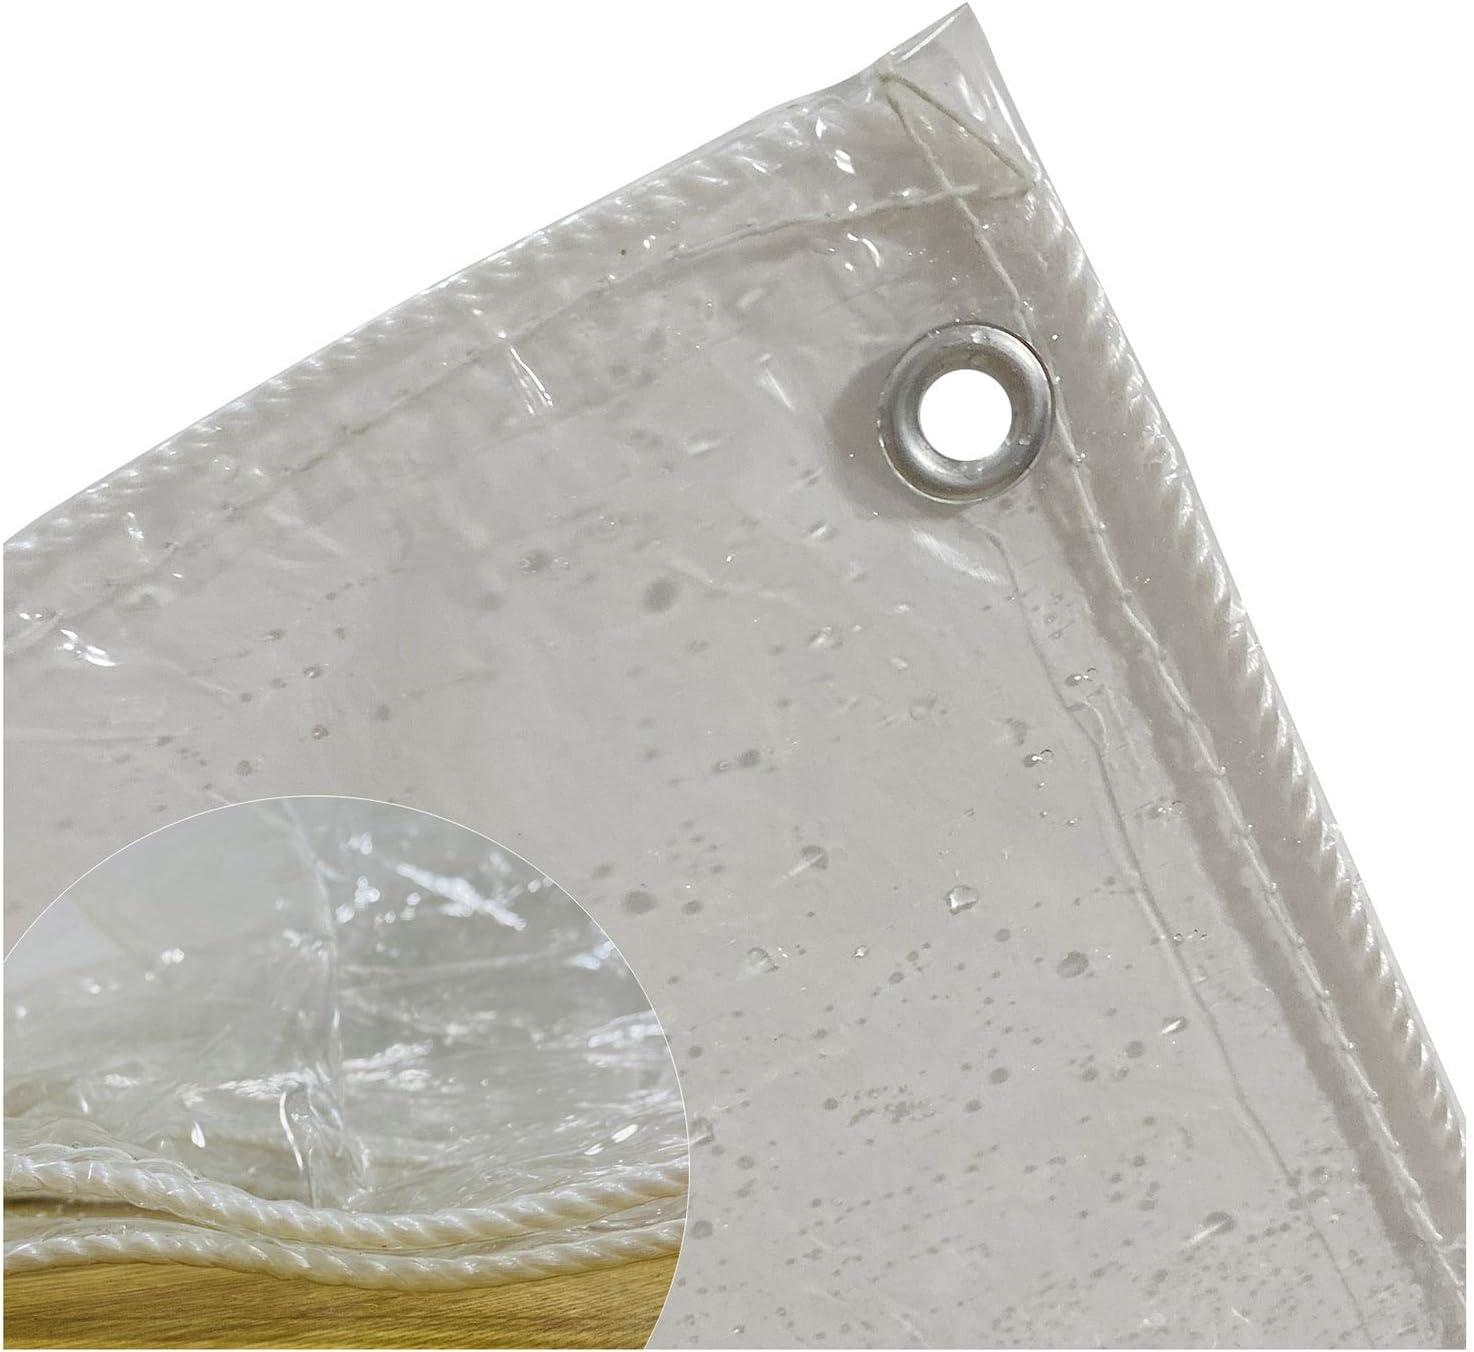 Tarp MYAN Transparent trust Tarpaulin PVC Seattle Mall Waterproof Soft